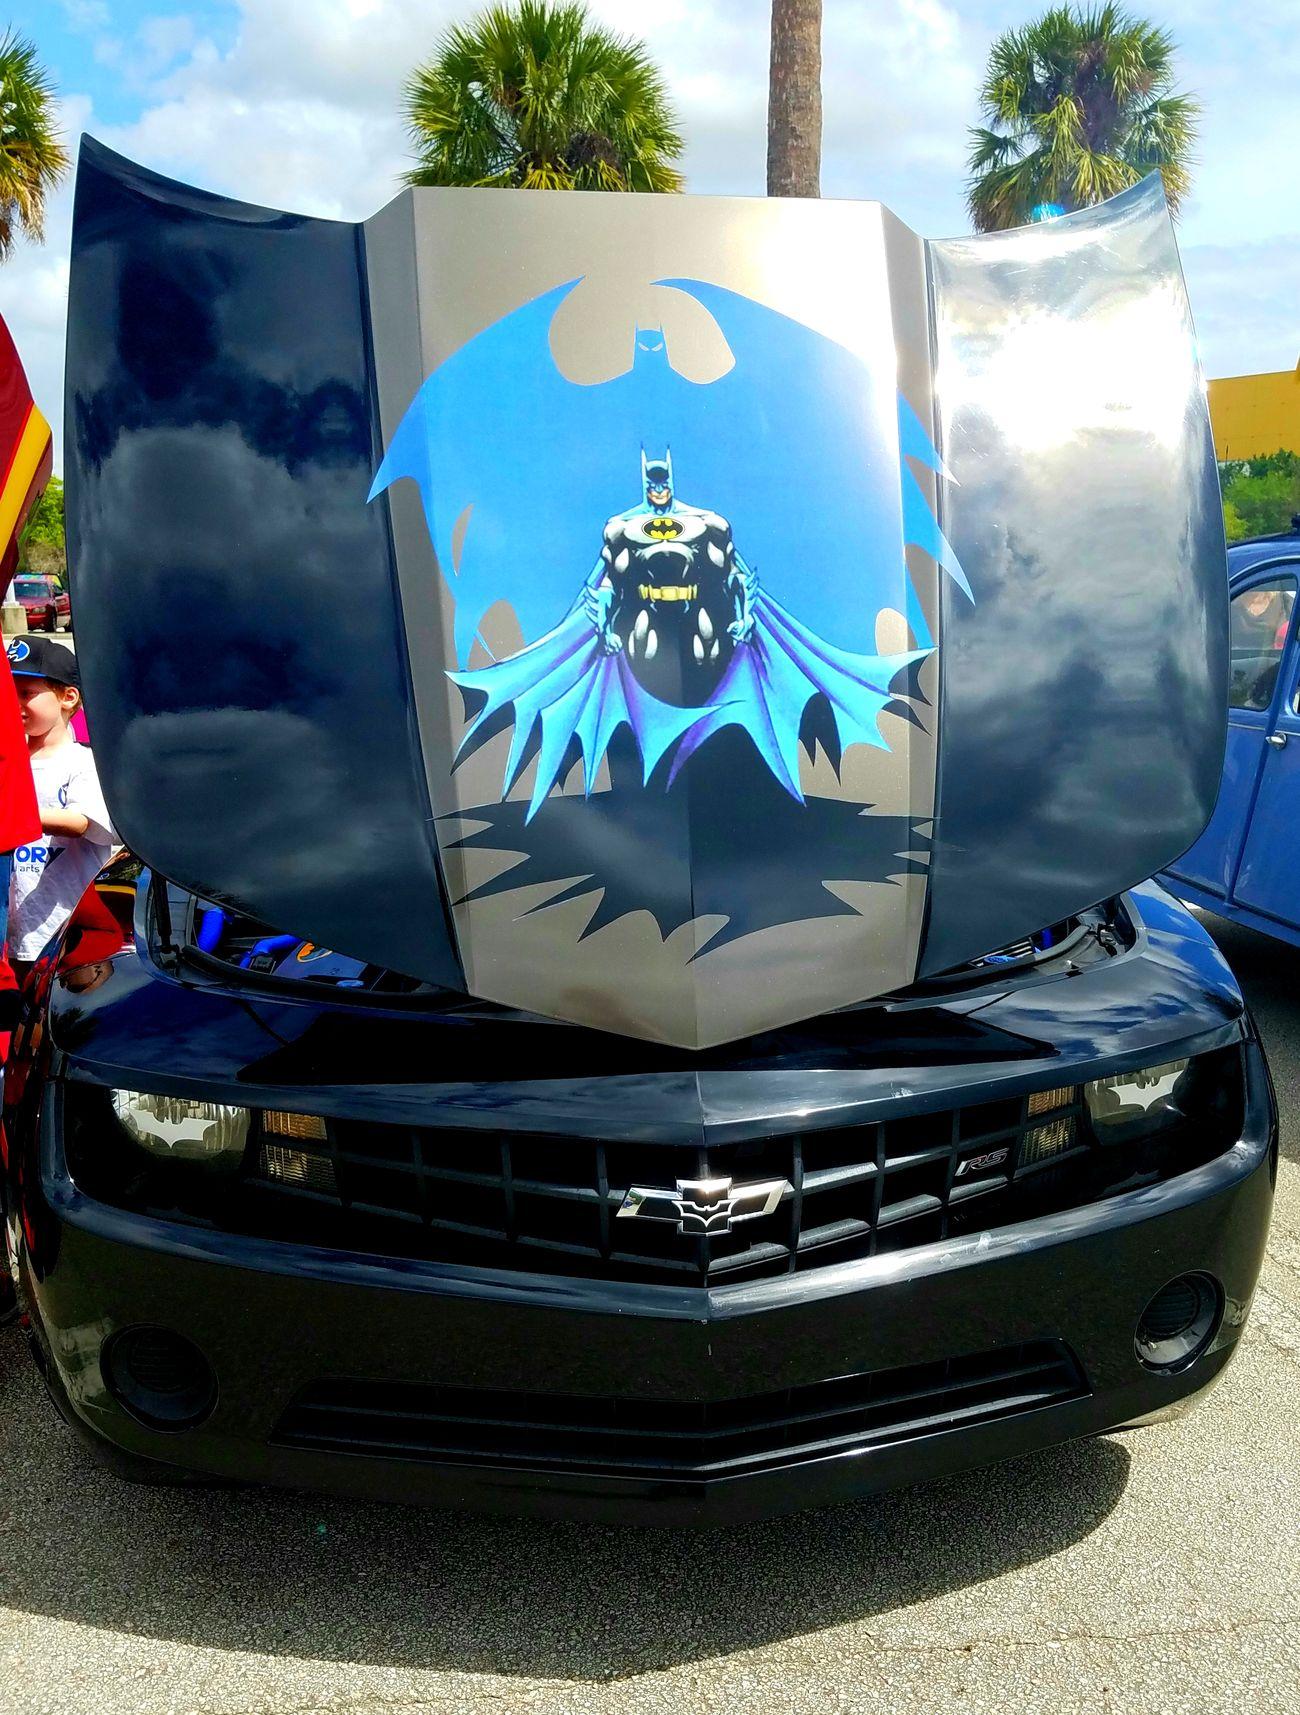 Batman Batmobile Blue Black Glare Reflection Vehicle Exterior Day Sunnyday🌞 CarShow